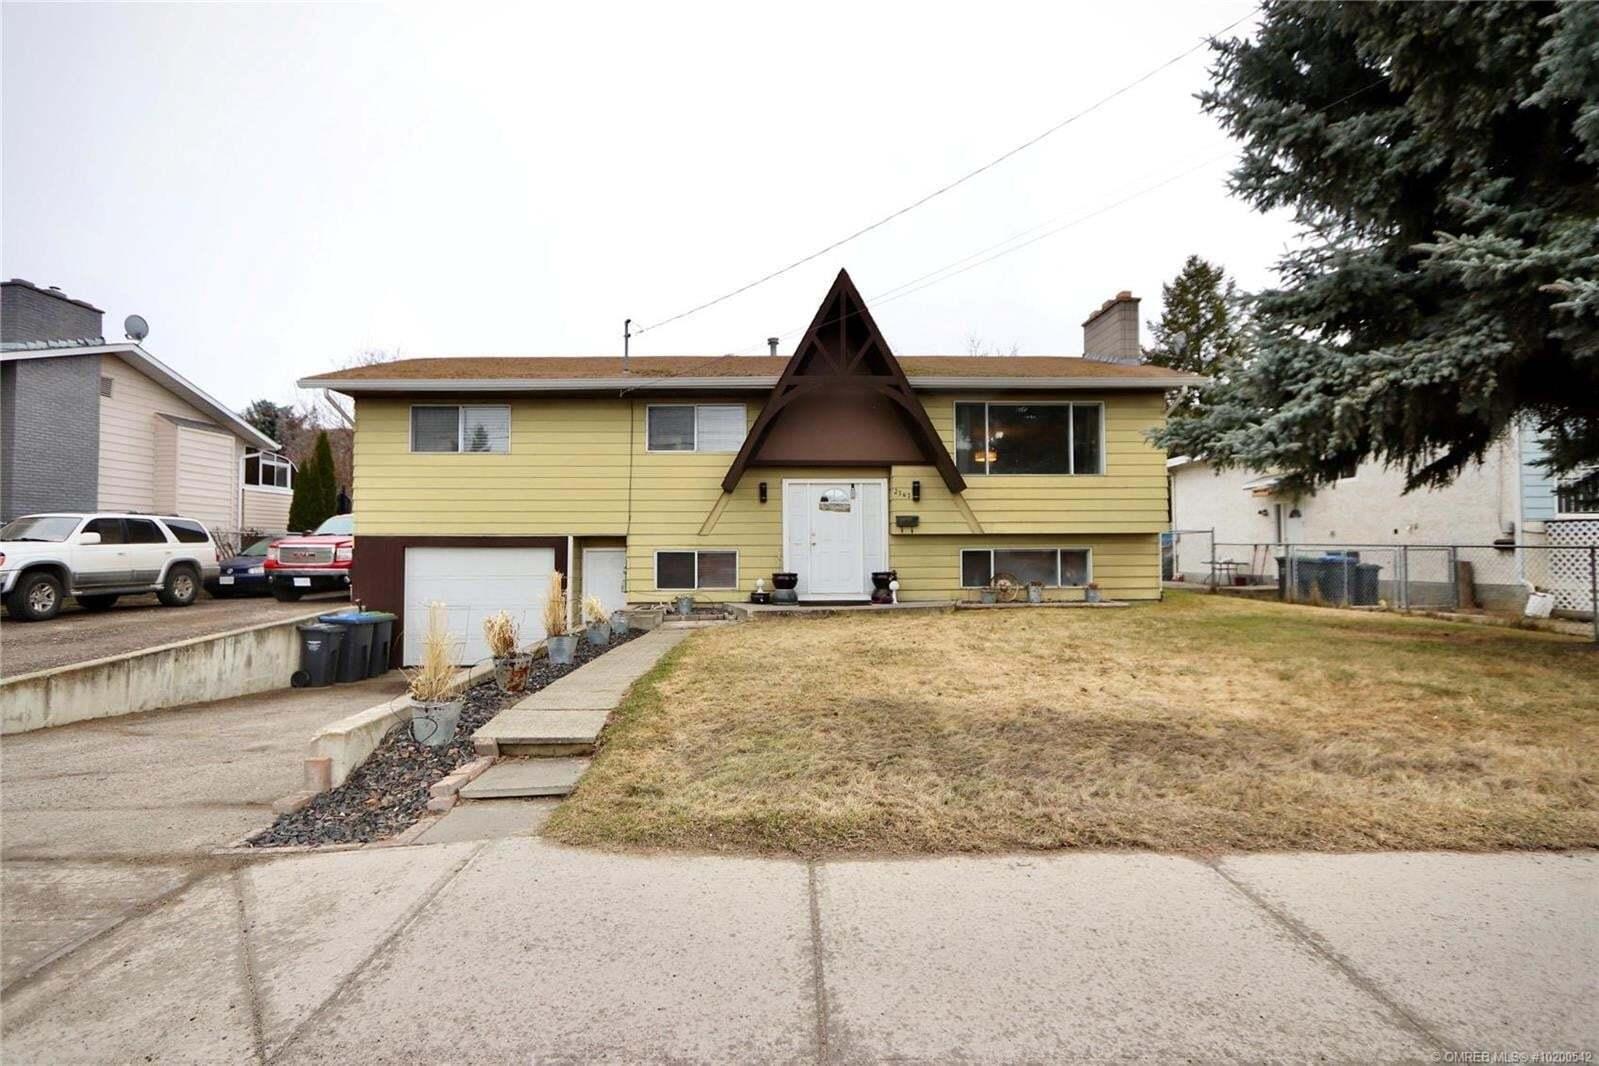 House for sale at 2747 Springfield Rd Kelowna British Columbia - MLS: 10200542